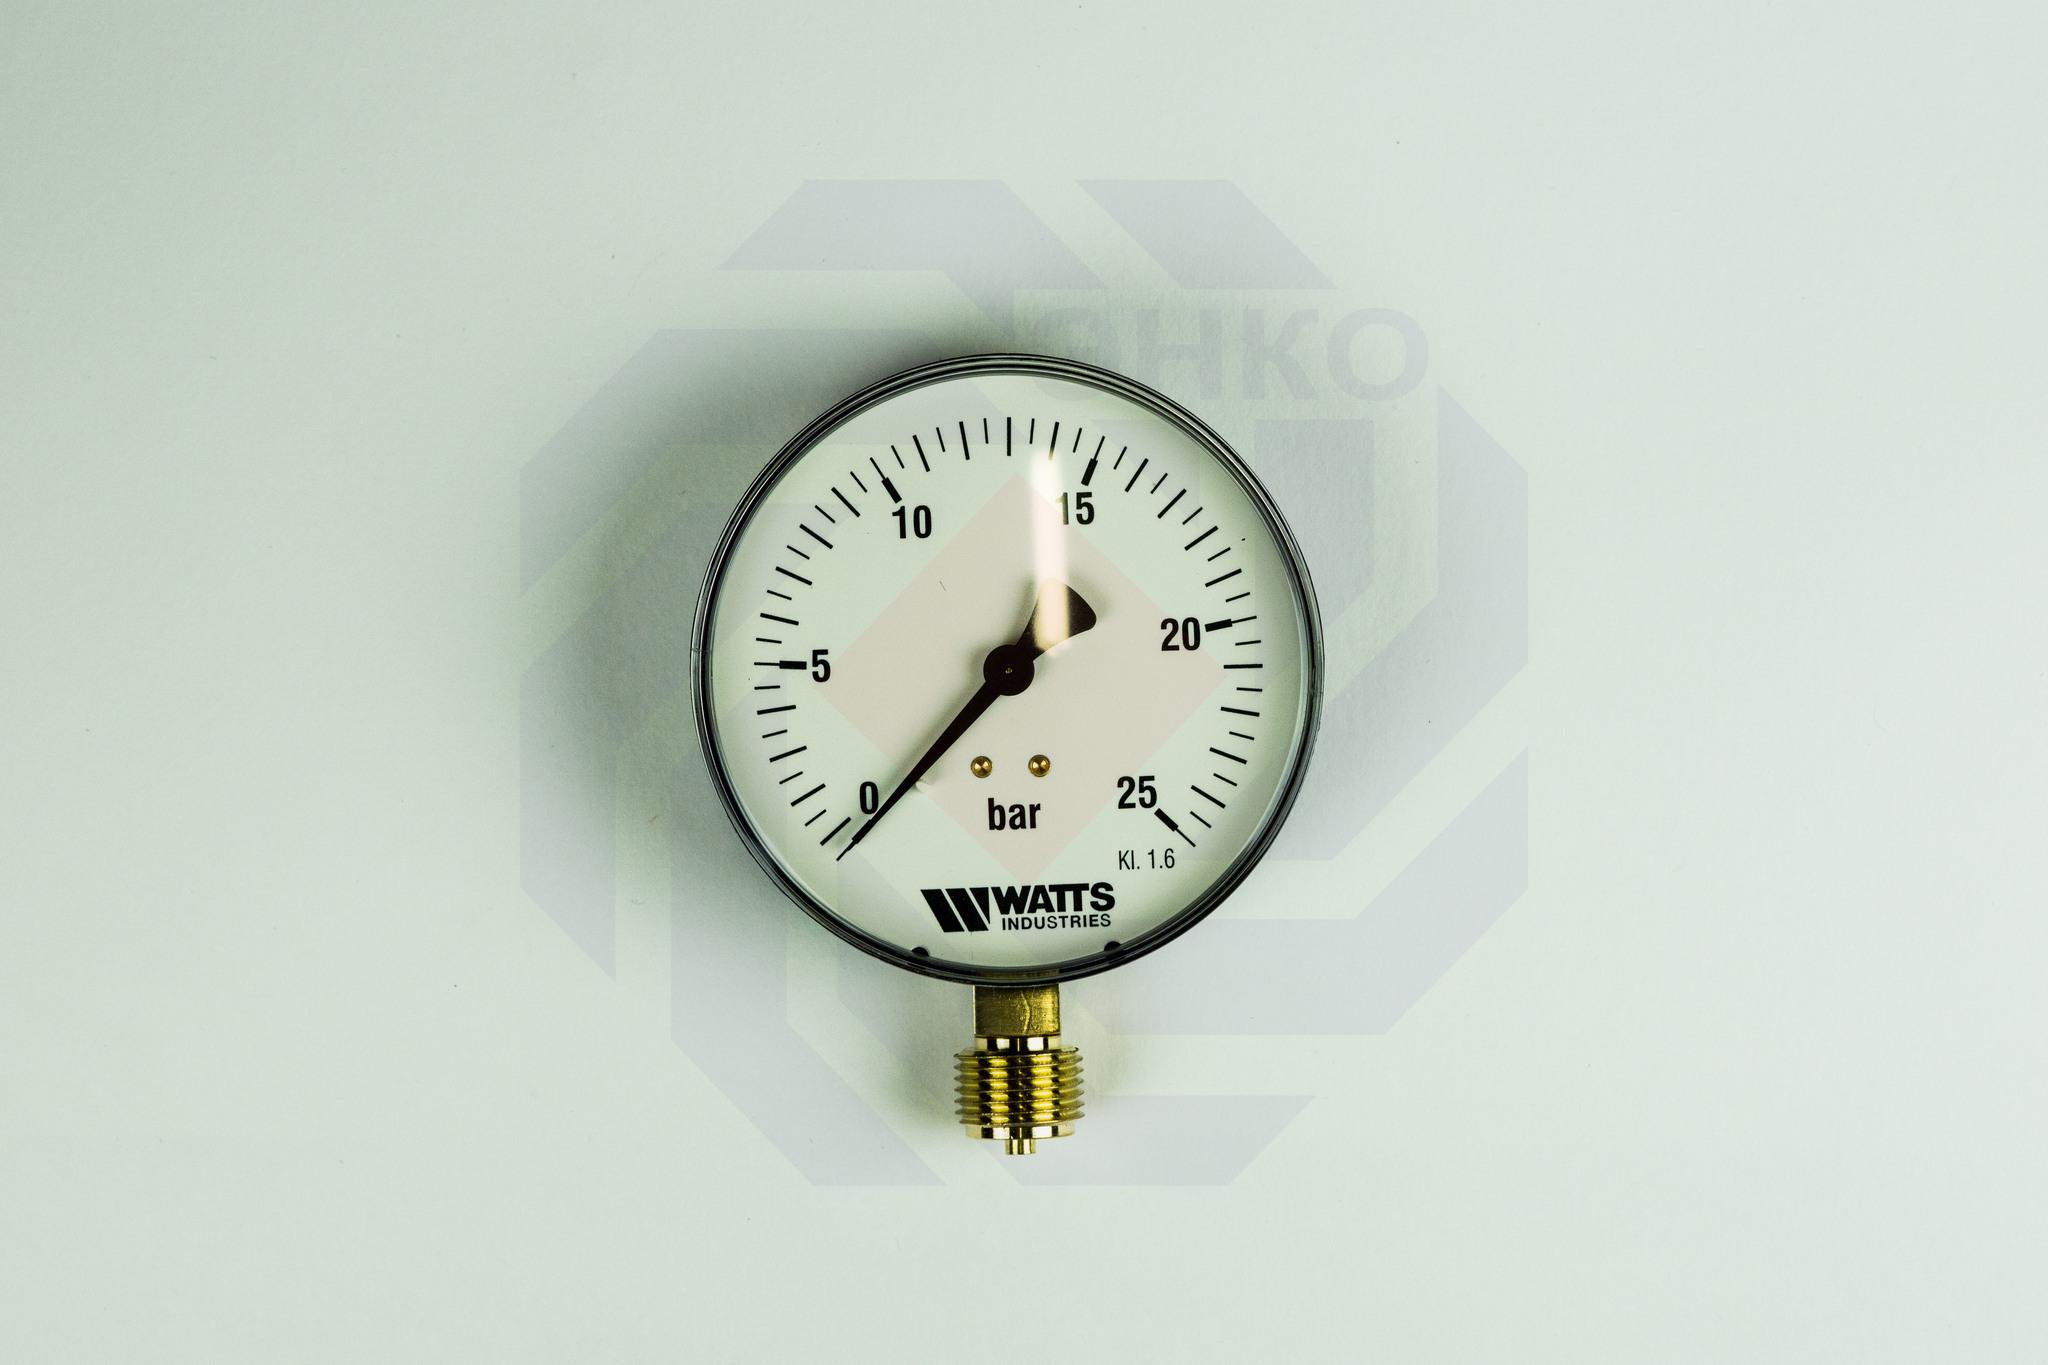 Манометр радиальный WATTS MDR 100/25 (F+R250) 0-25 бар 100 мм ½